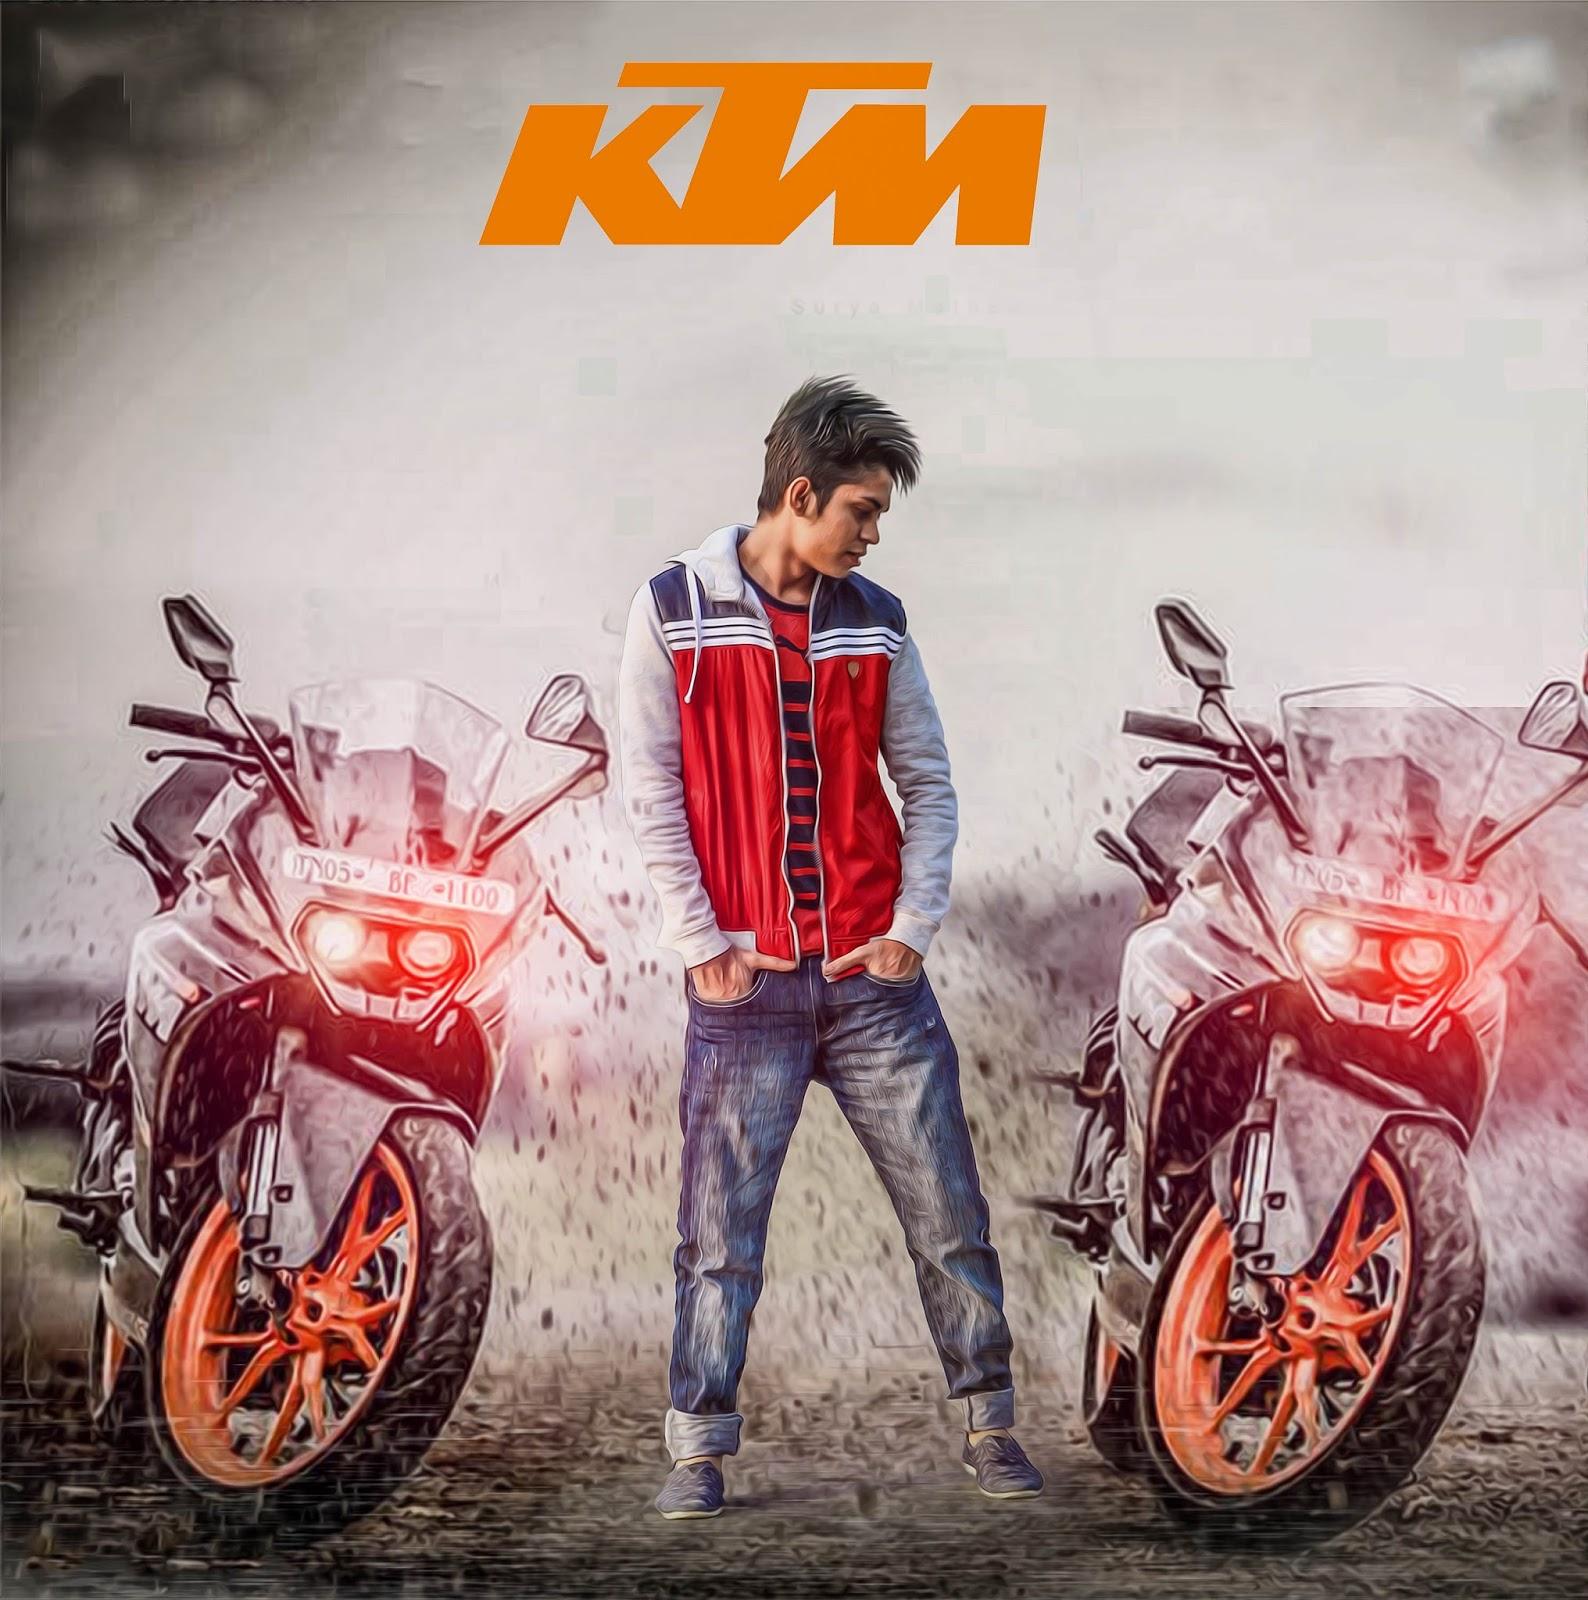 Making ktm bike photoshop manipulation tutorial make perfect feel real making ktm bike photoshop manipulation tutorial baditri Gallery